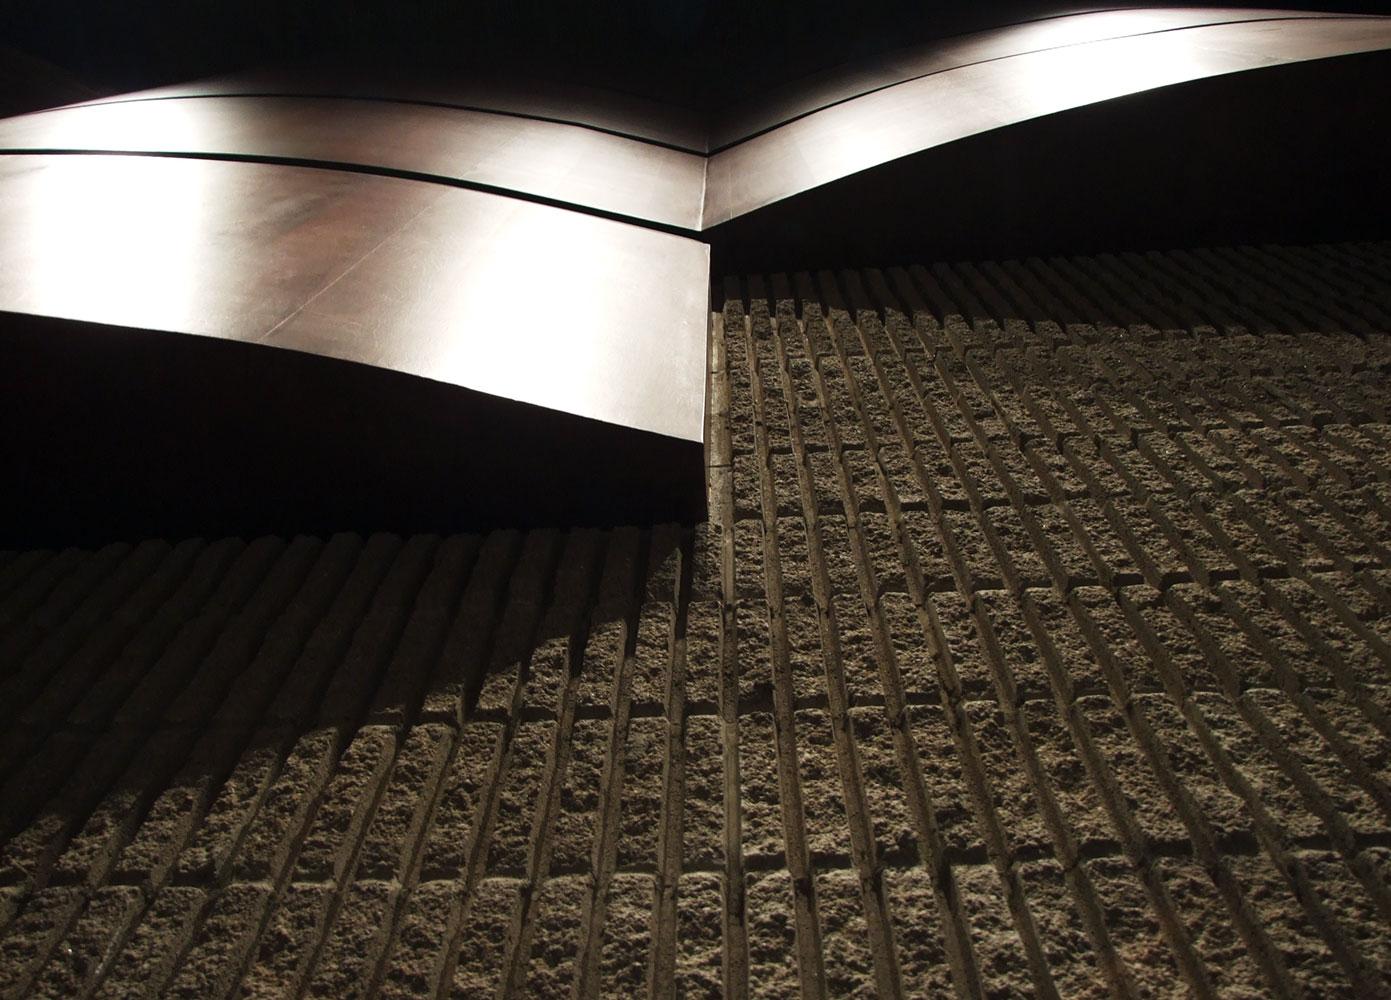 grand-rapids-michigan-certified-concrete-varisplit-5.jpg